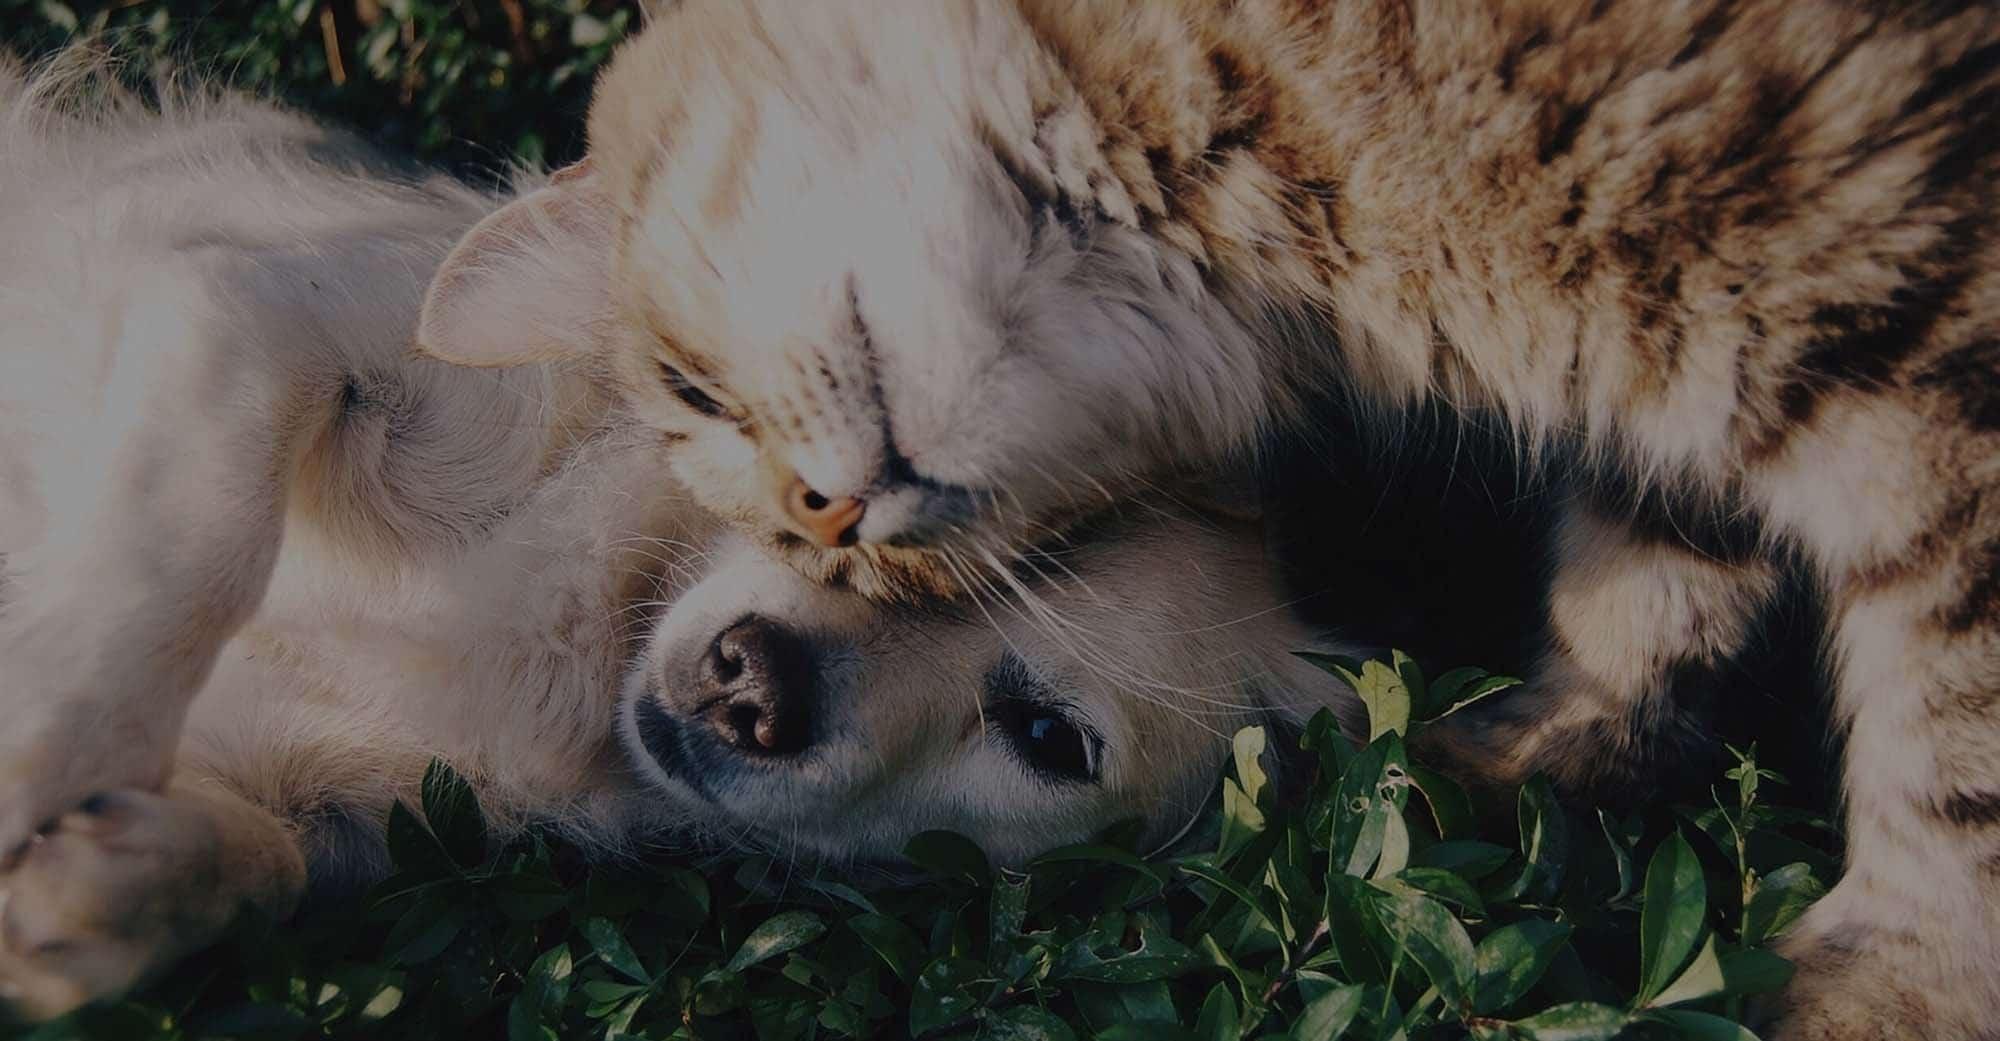 Association Mona-lise refuge pour animaux don header